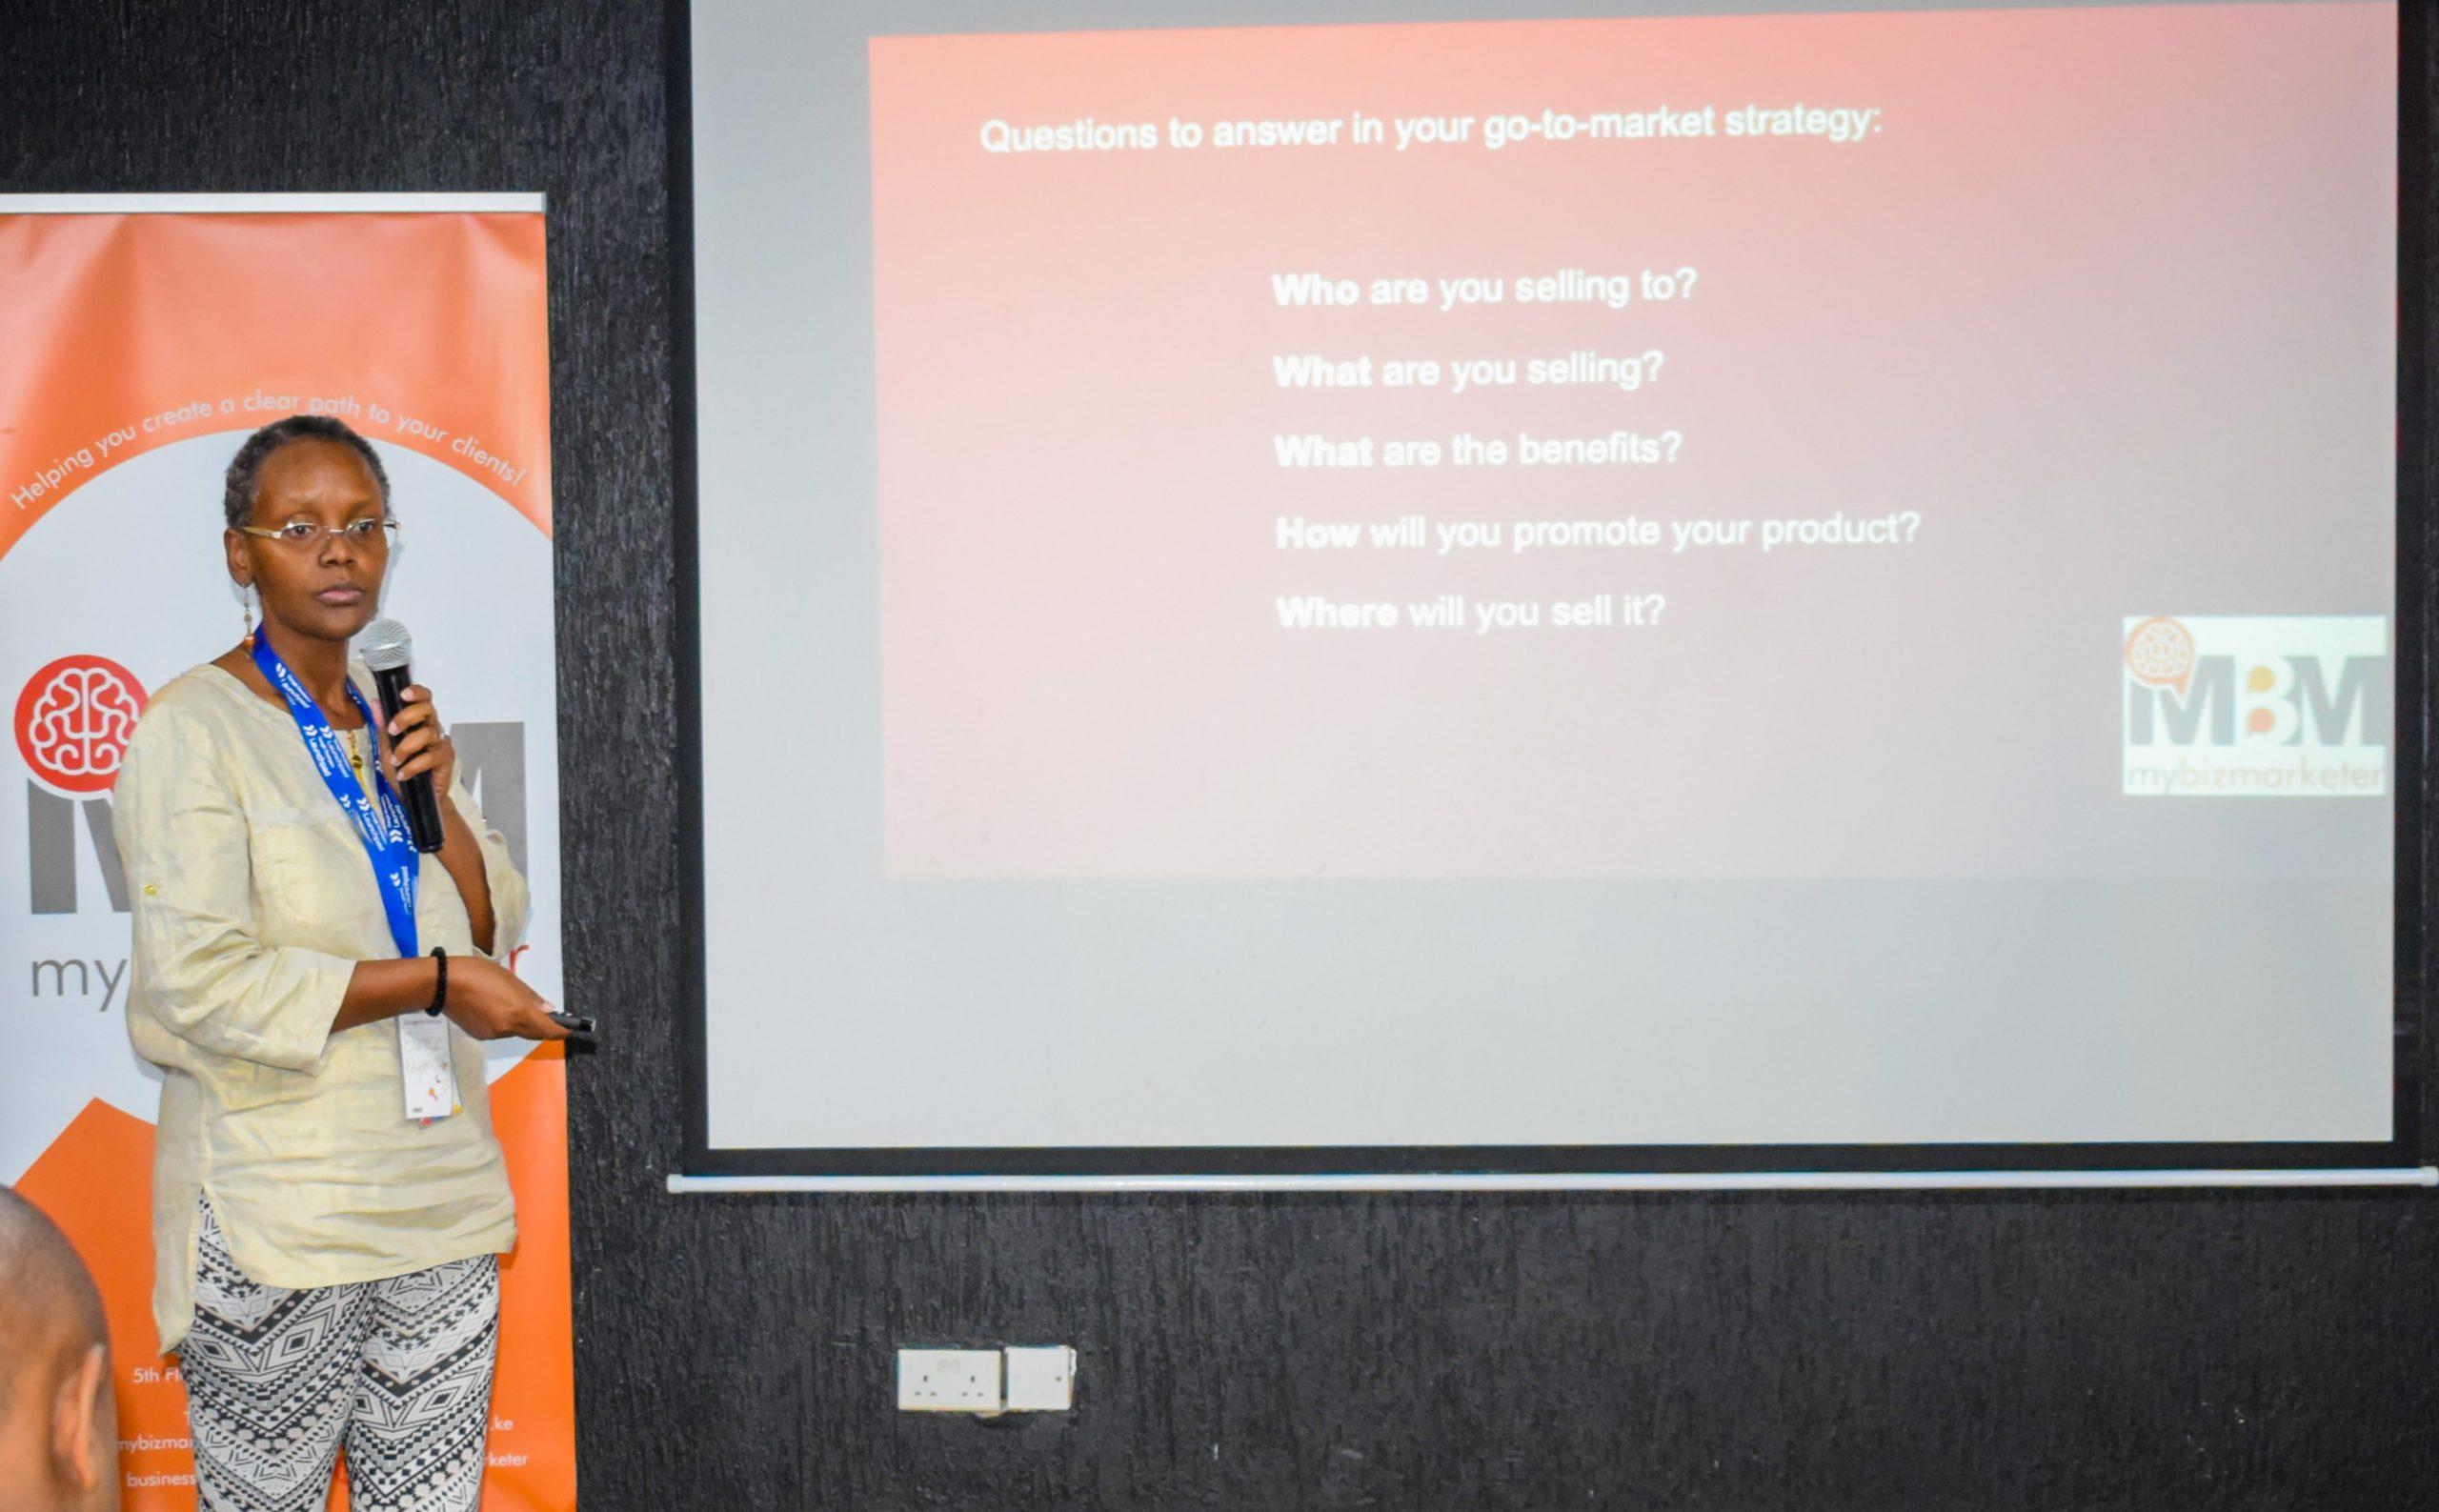 SWWE-Kenya-L-E-A-D-Program-Eunice-Nyandat